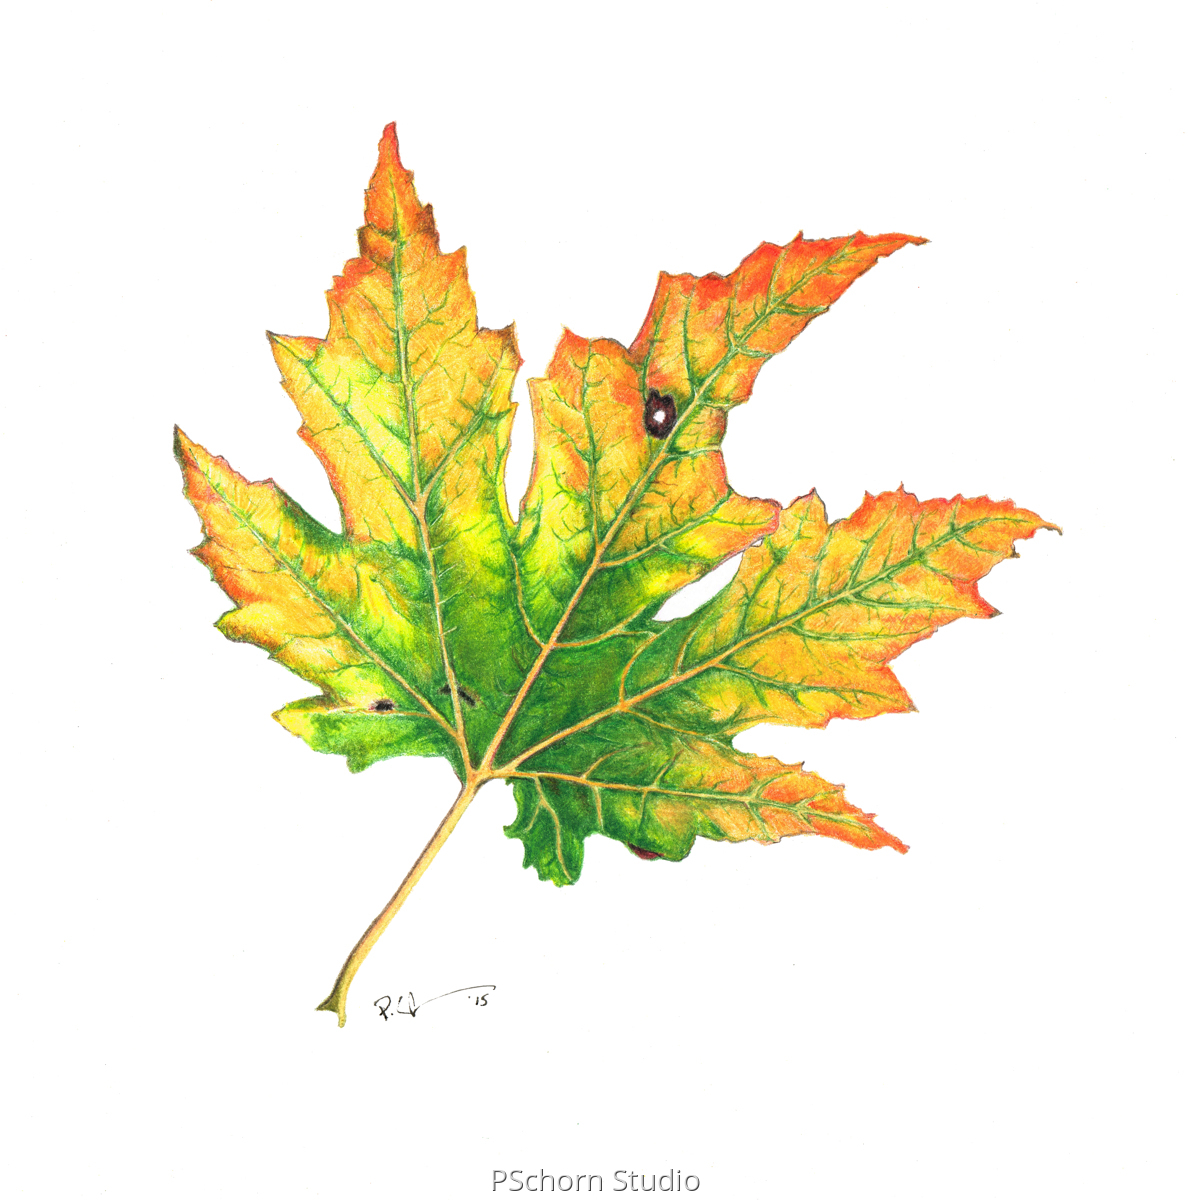 Leaf 8 (large view)